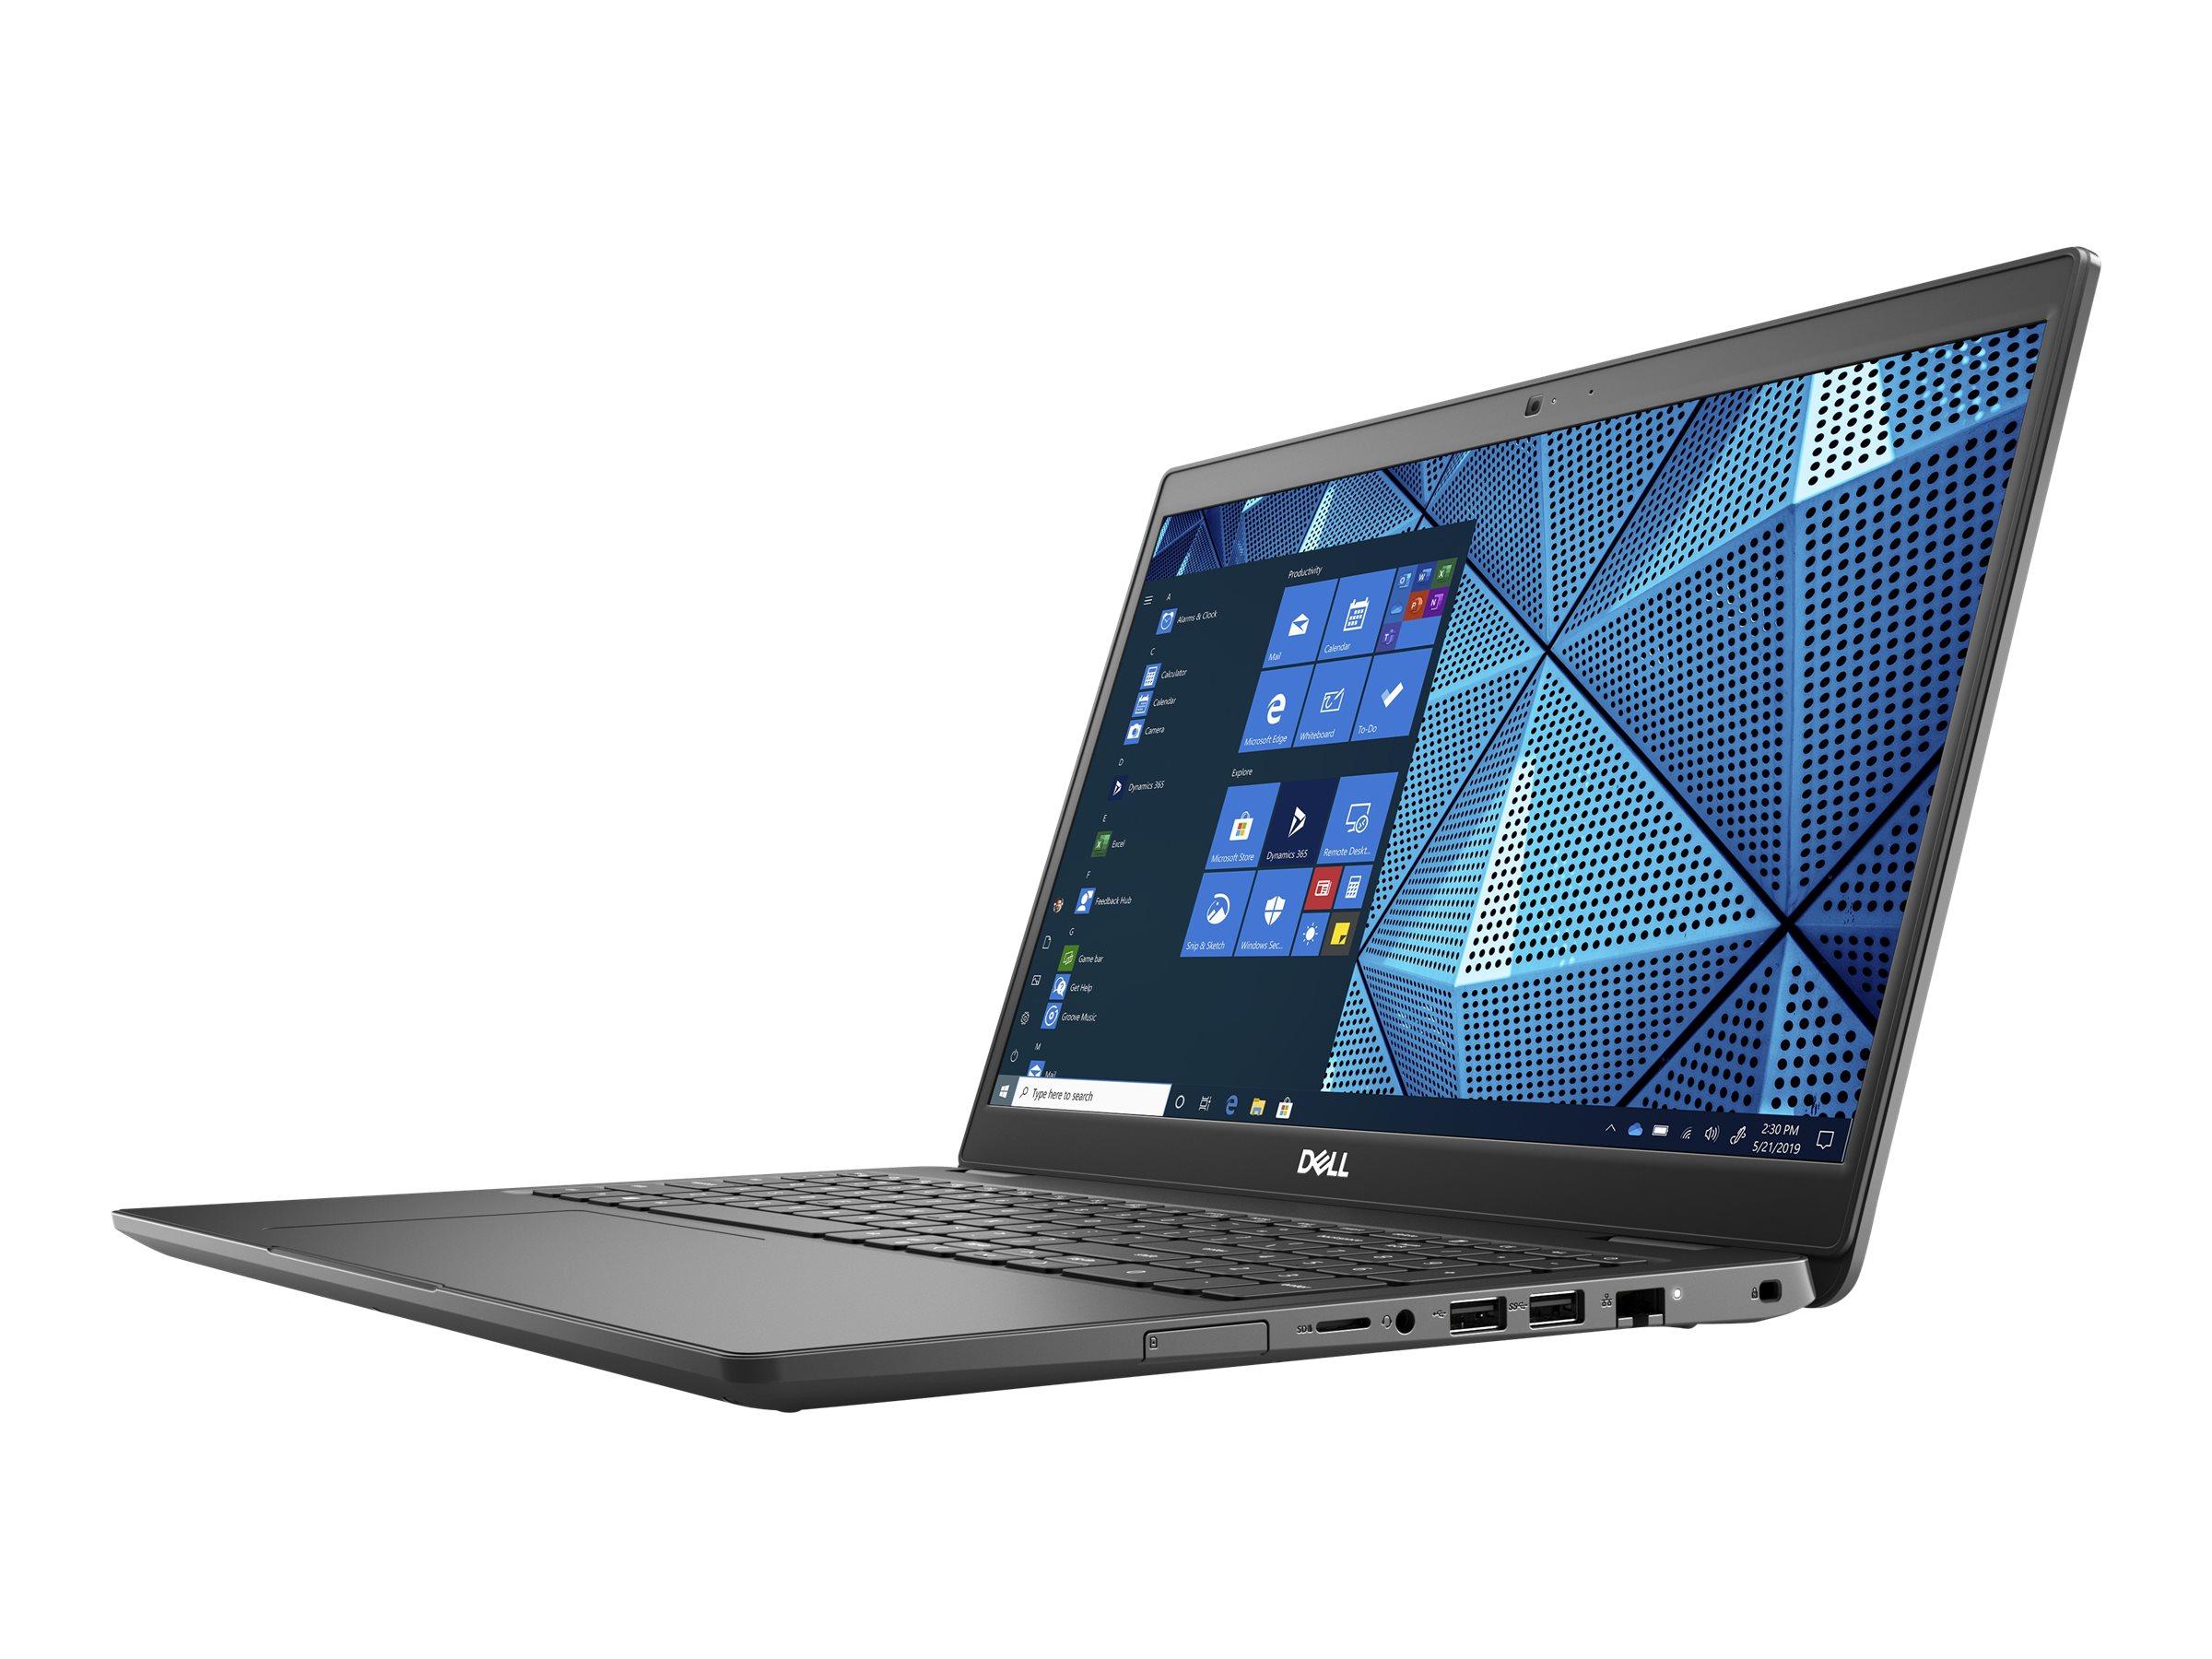 "Dell Latitude 3510 - Core i3 10110U / 2.1 GHz - Win 10 Pro 64-Bit - 8 GB RAM - 256 GB SSD NVMe - 39.49 cm (15.6"")"